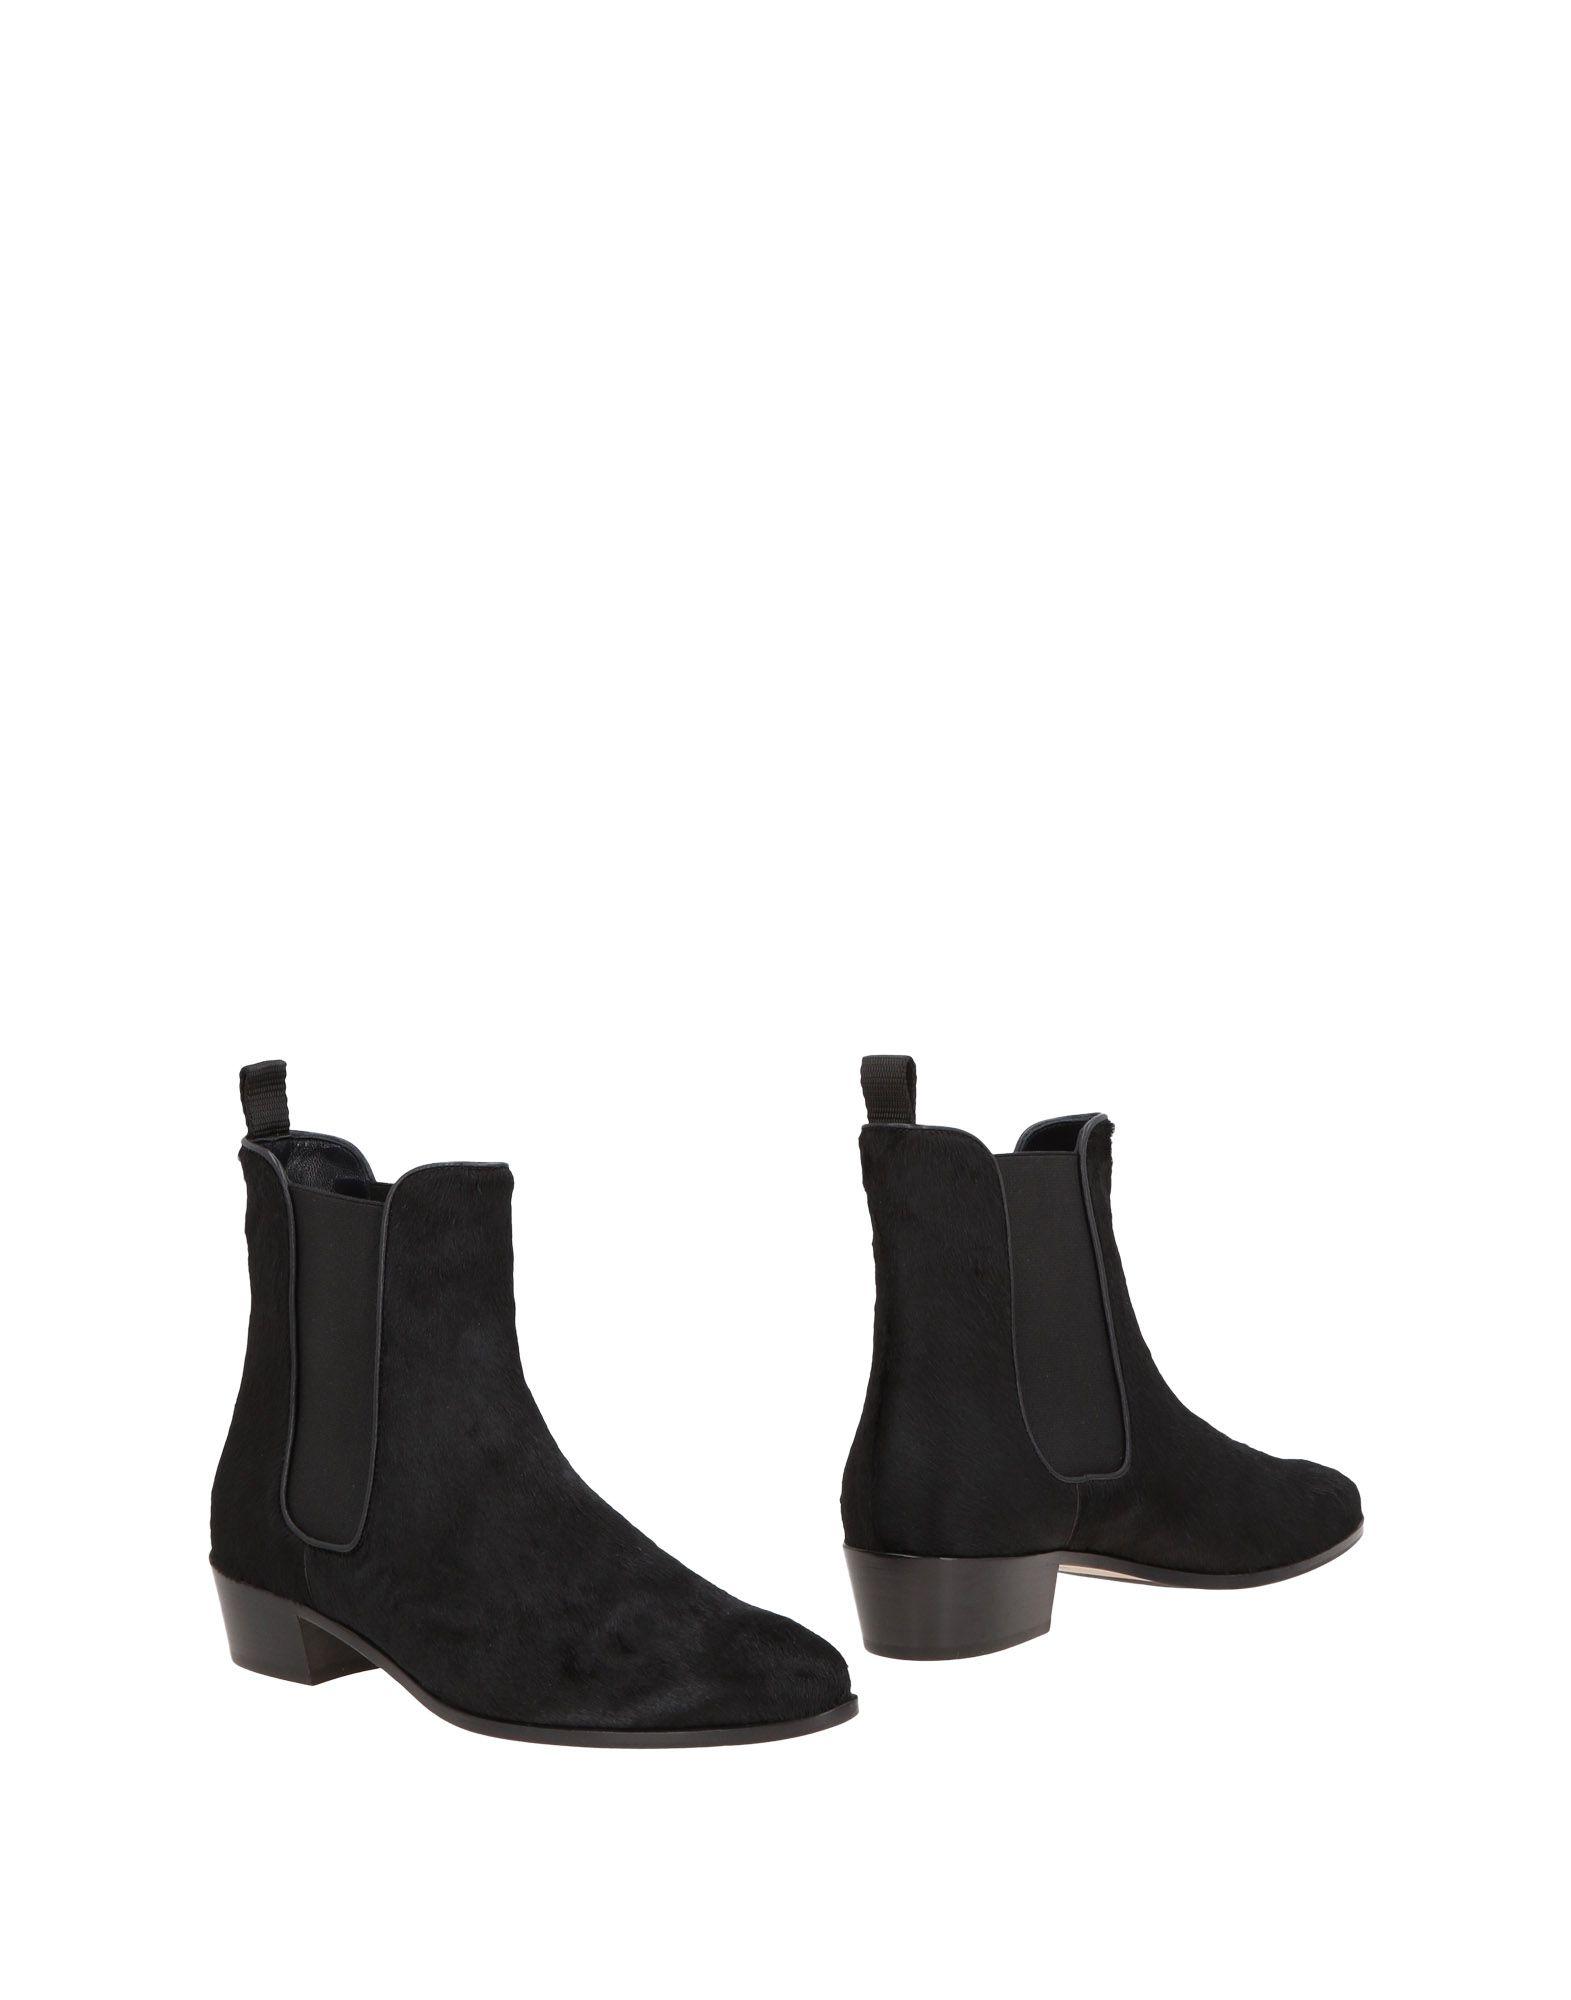 Chelsea Boots La Corte Della Pelle By Franco Ballin Donna - 11477744EE